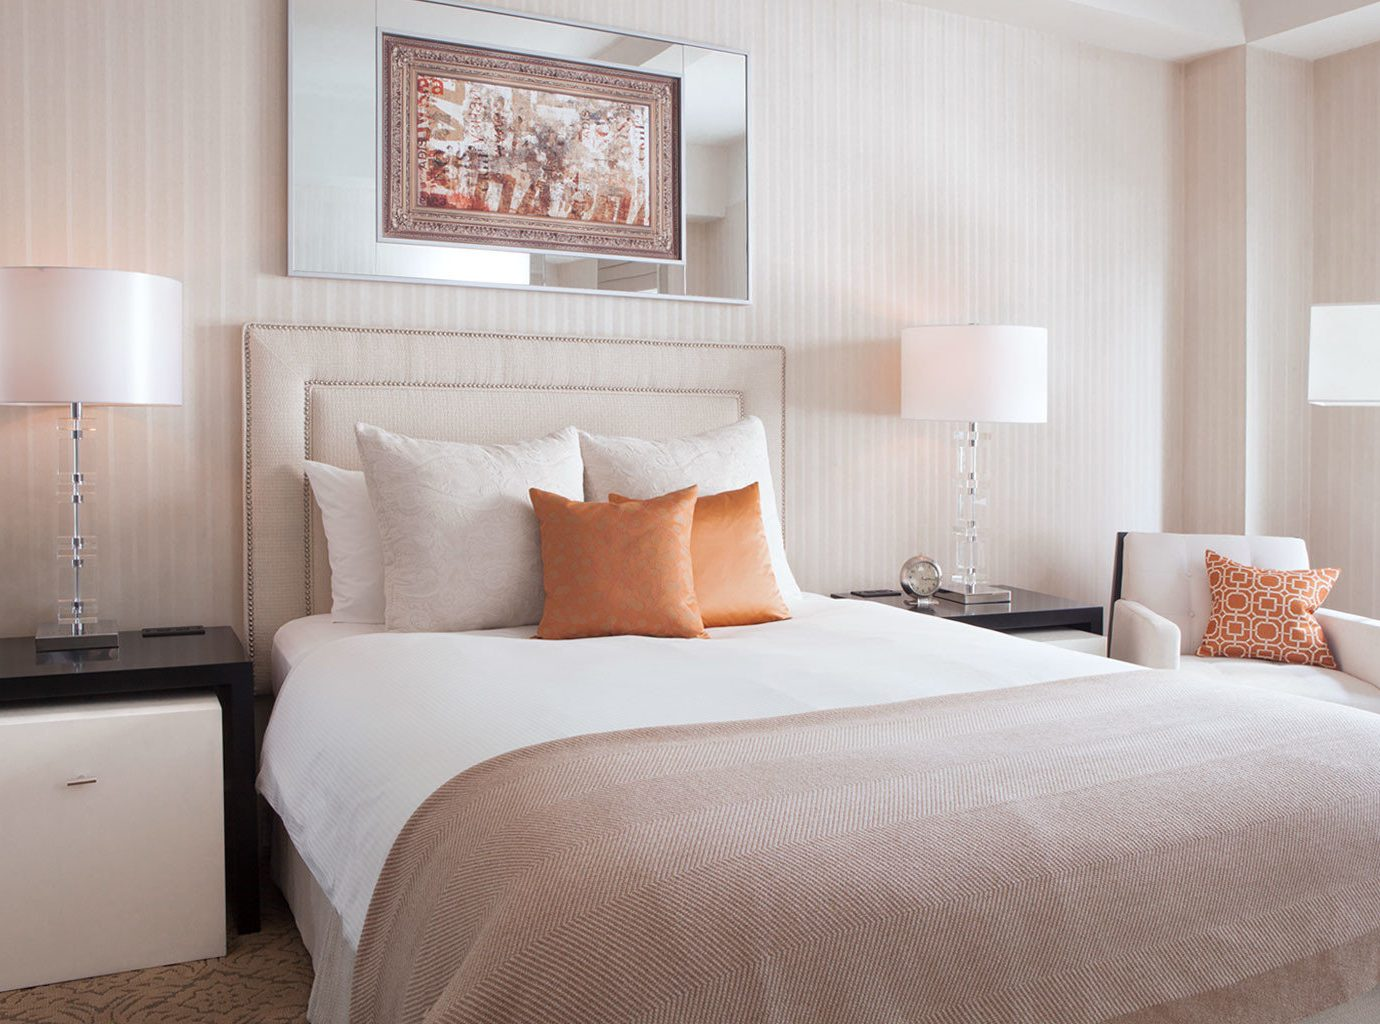 Bedroom Boutique City Modern Offbeat bed indoor wall hotel sofa room property Suite scene interior design furniture bed sheet floor orange bed frame pillow cottage duvet cover lamp